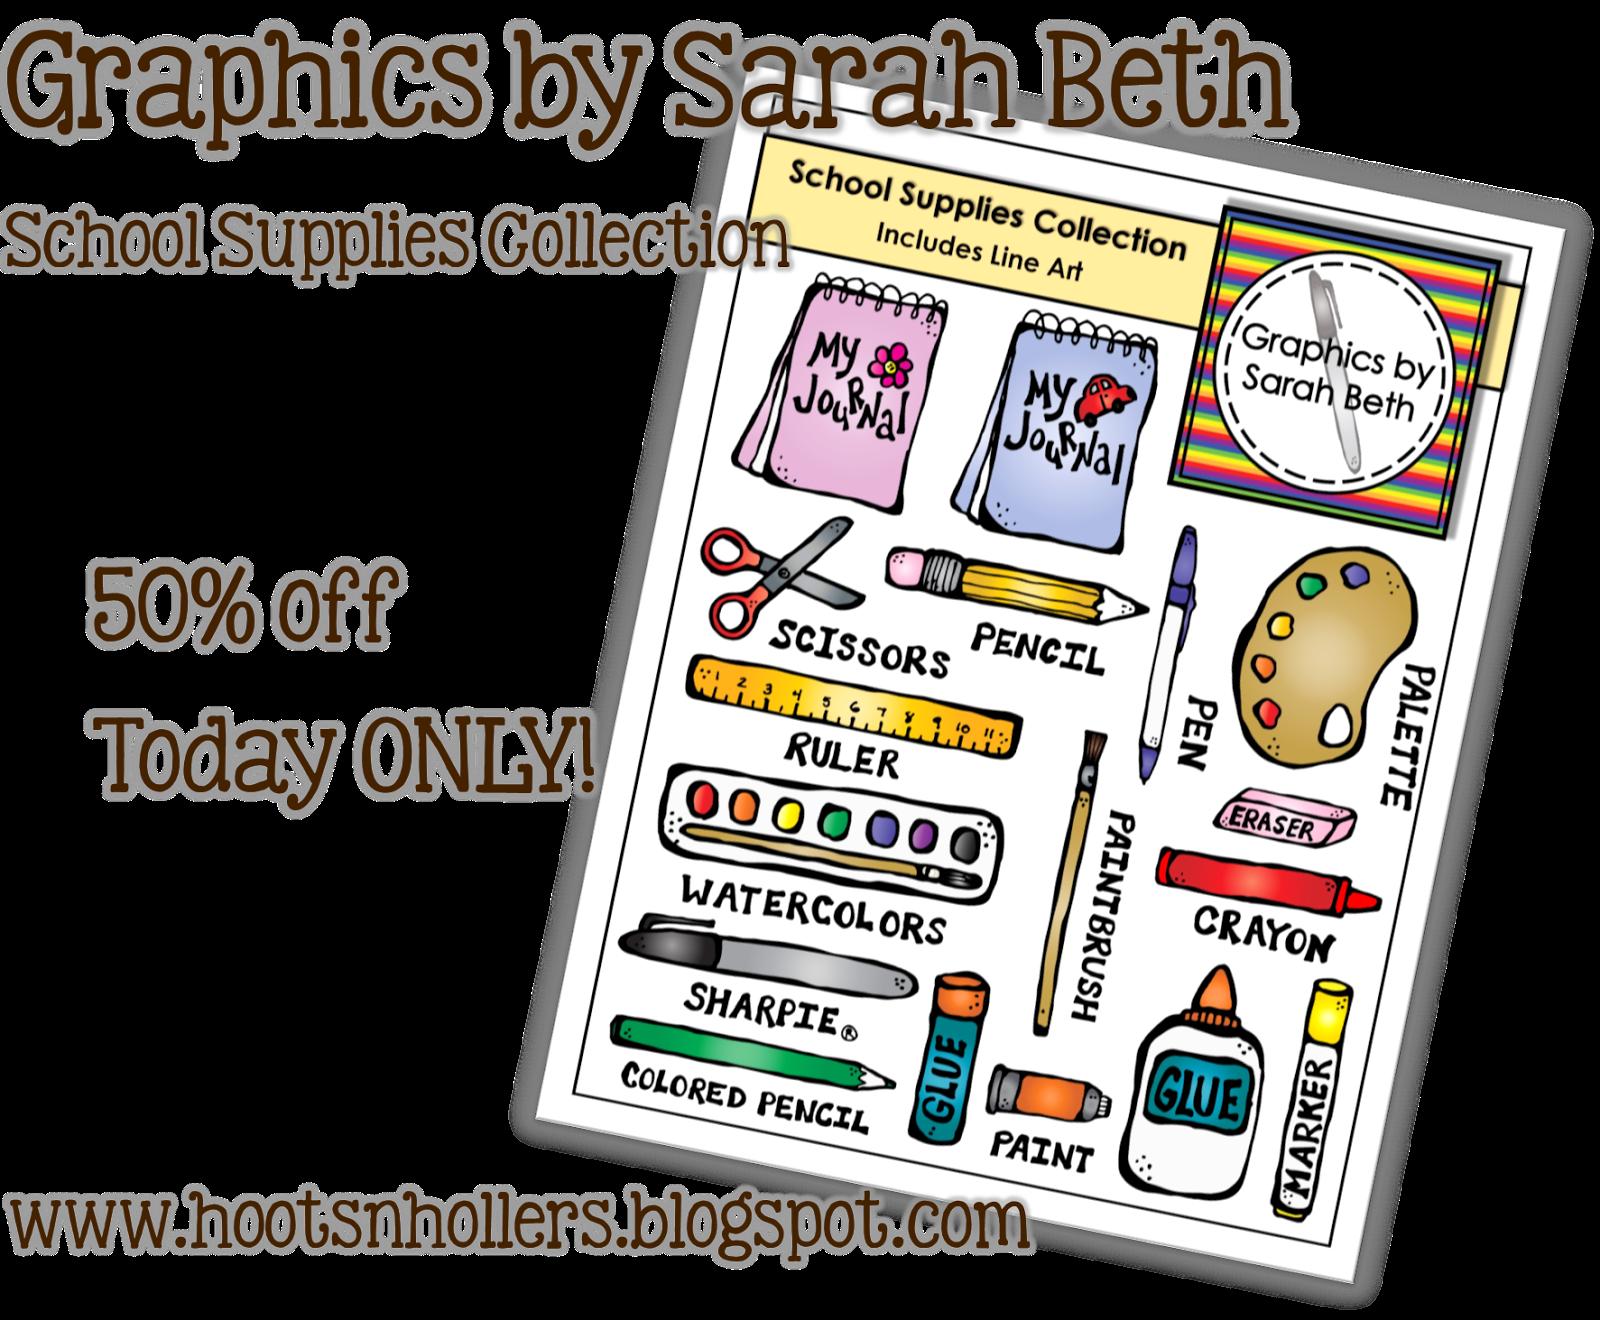 http://www.teacherspayteachers.com/Product/School-Supplies-Collection-Graphics-School-Clipart-728627